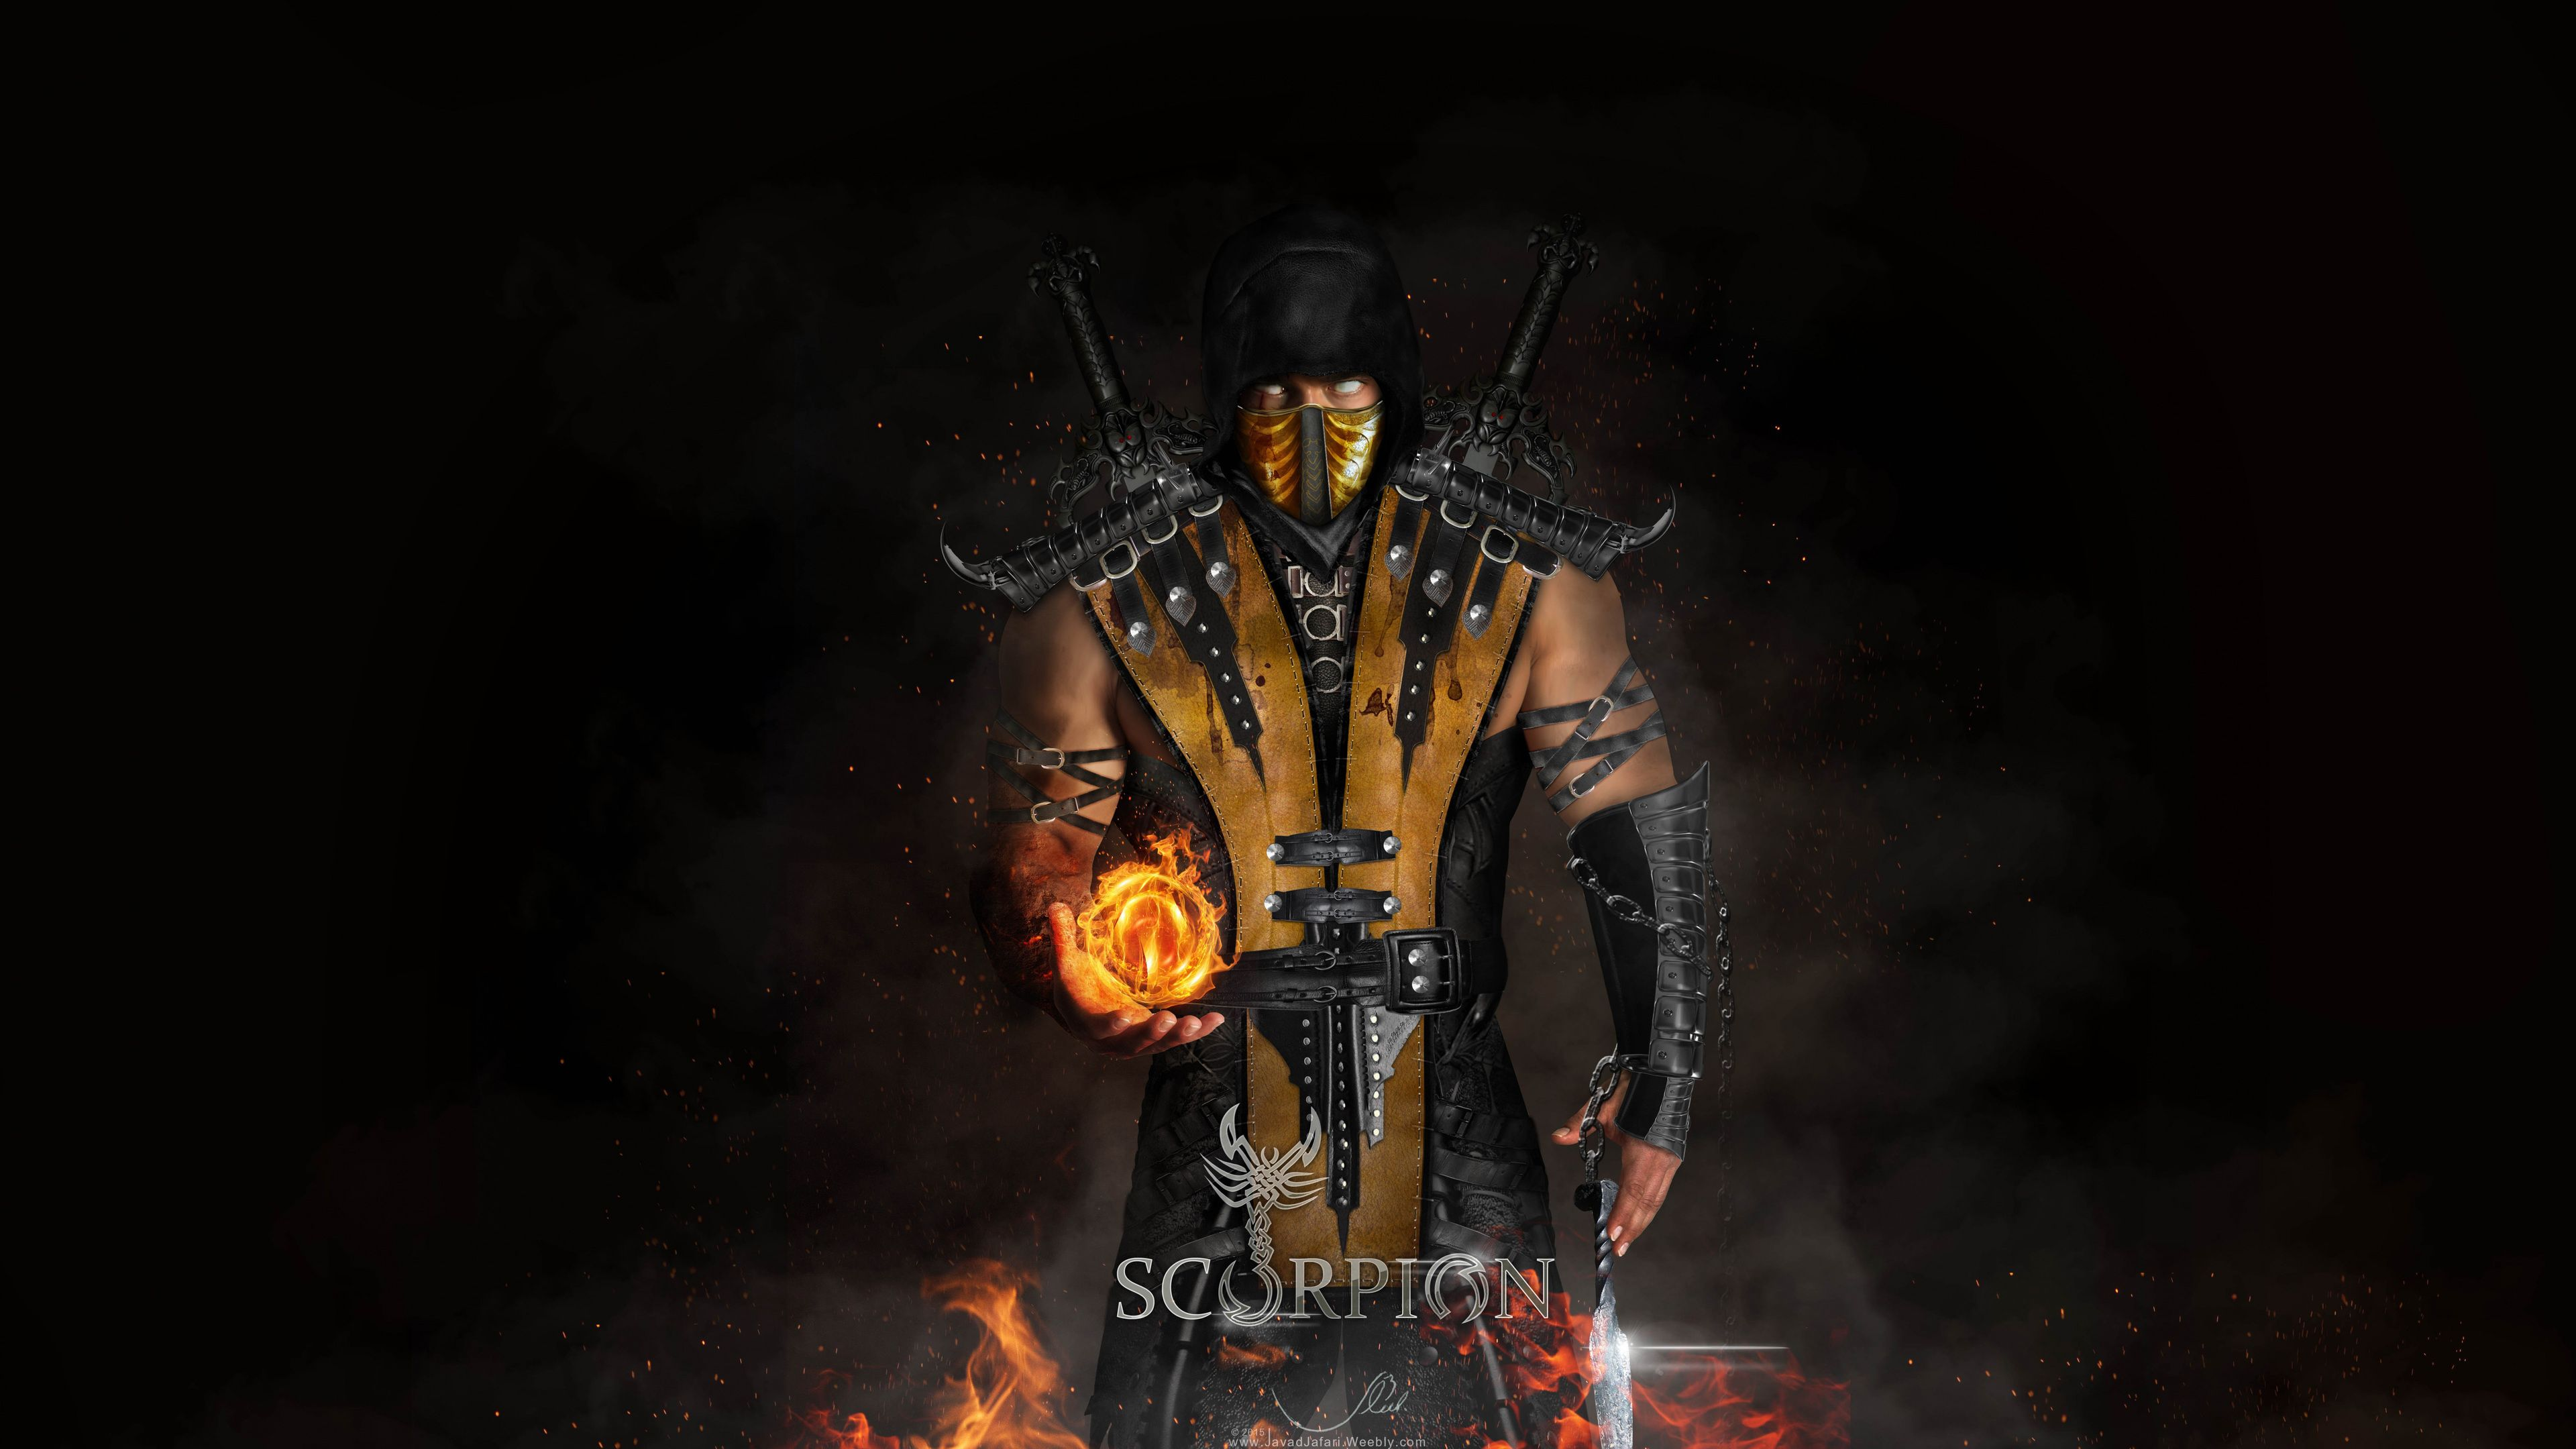 Scorpion Mortal Kombat X 4k Xbox Games Wallpapers Ps Games Wallpapers Pc Games Wallpapers Mo Scorpion Mortal Kombat Mortal Kombat X Mortal Kombat X Scorpion